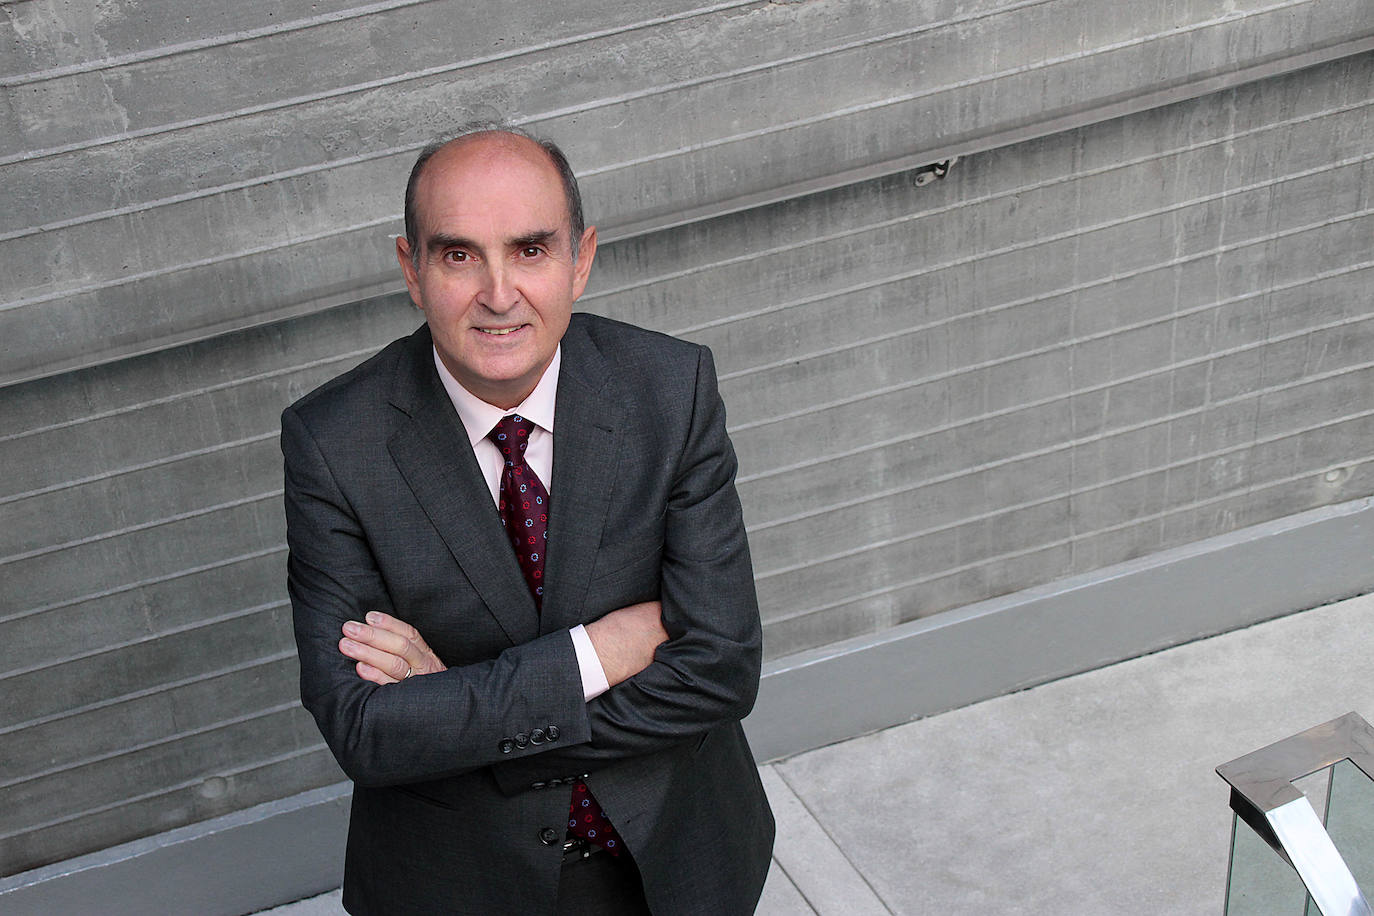 Tomás Quintana, Procurador del Común